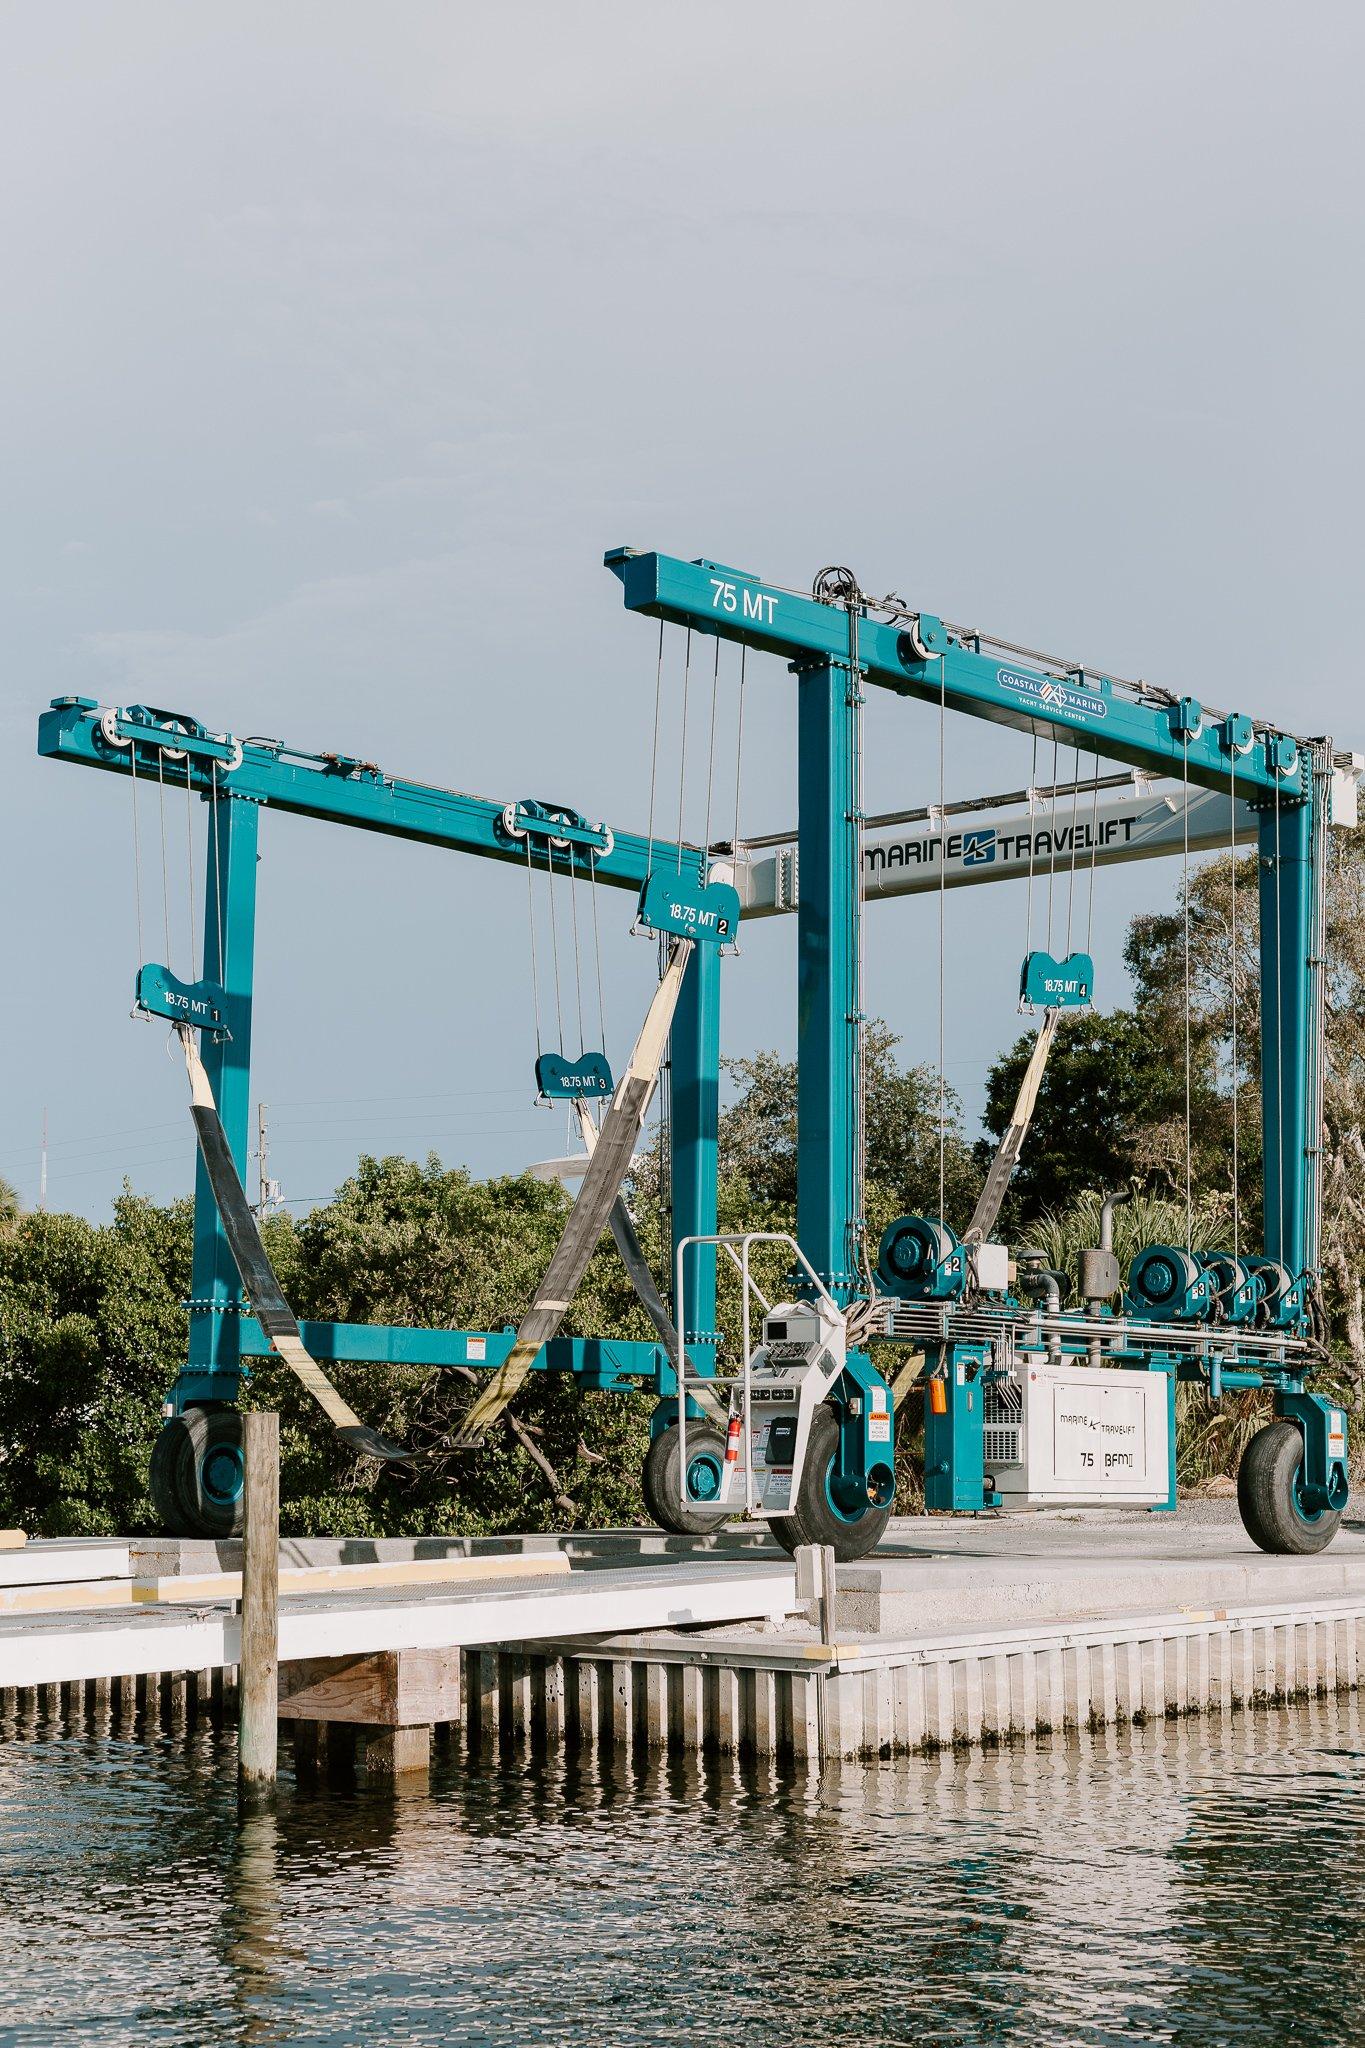 75 ton marine travel lift